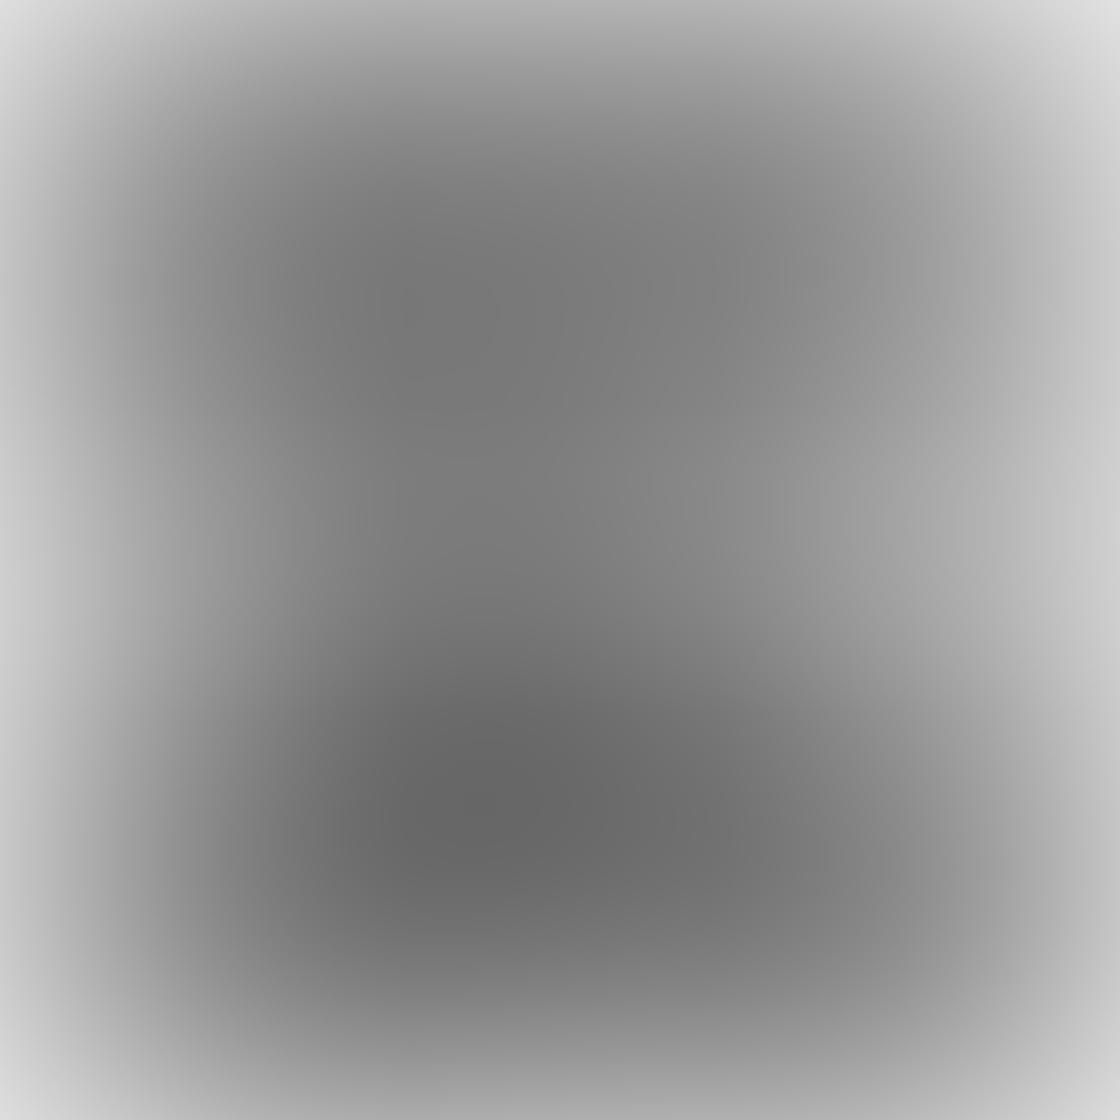 iPhone Photo Black White 11